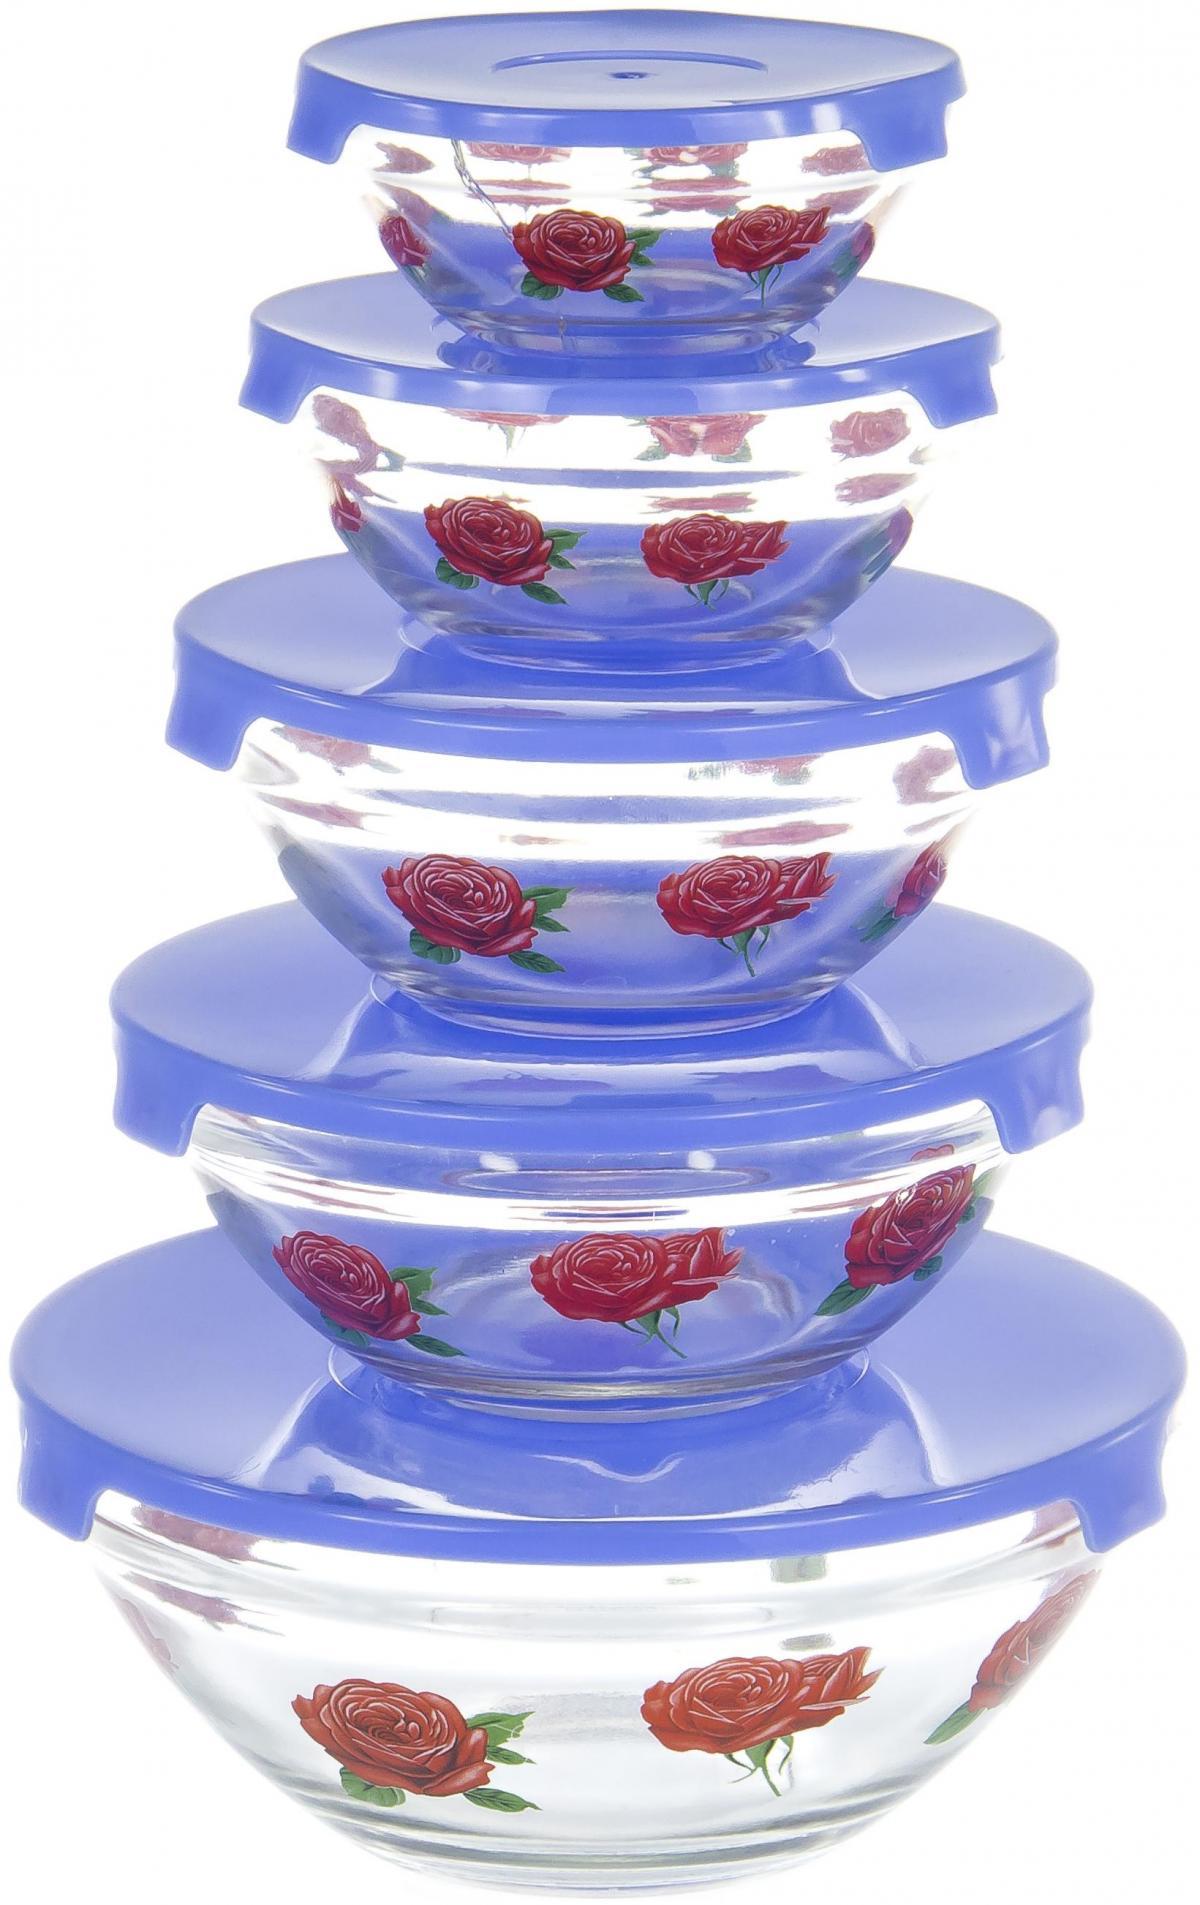 Набор салатников Olaff, с крышкой, 5 предметов. AX-5SB-B-01AX-5SB-B-01набор 5 салатников d-100мм, 103мм, 125мм, 140мм, 170мм с пластик.крышками, подарочная упаковка